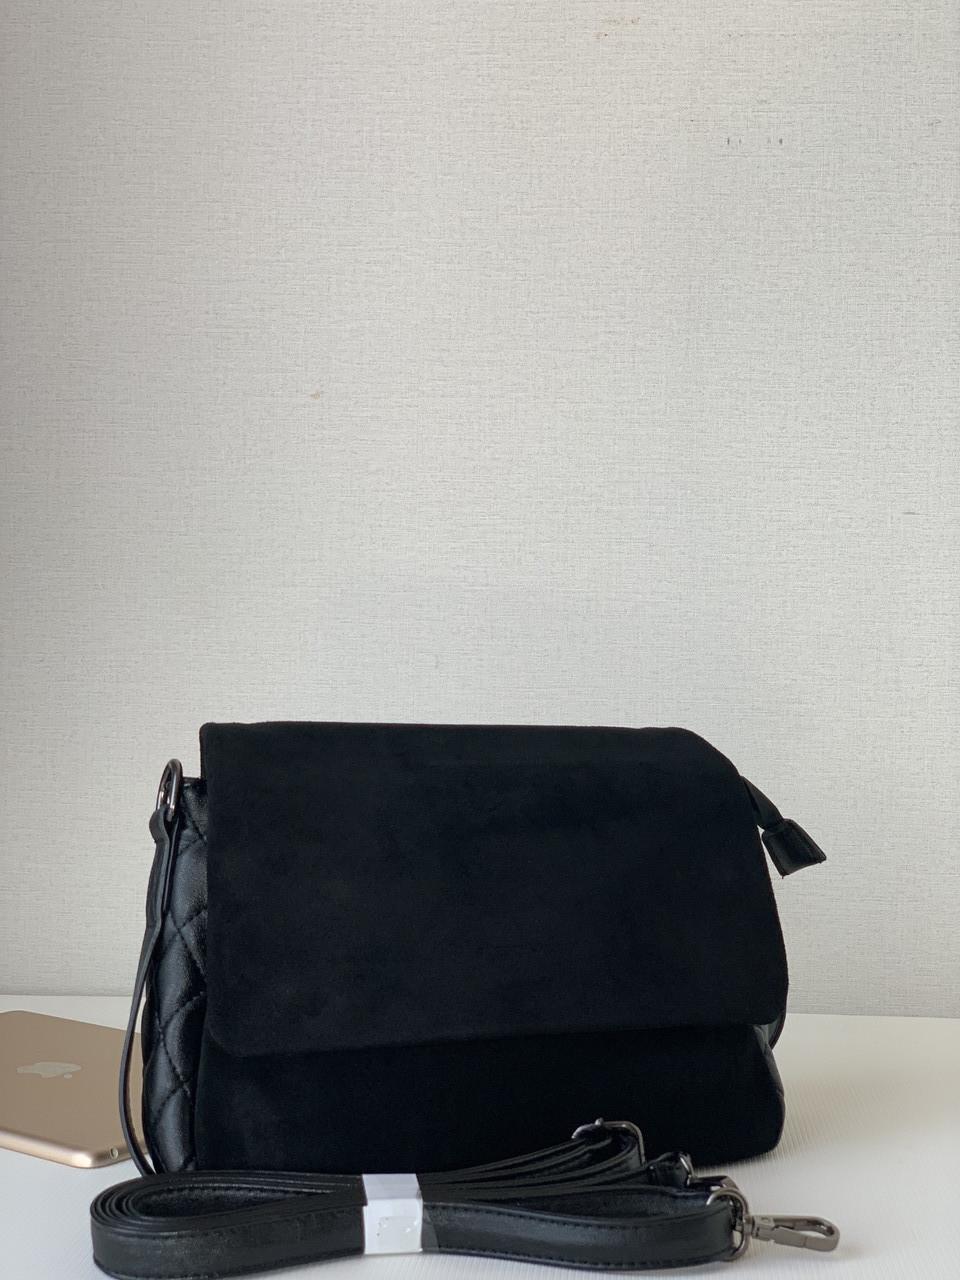 Жіноча чорна замшева кроссбоди-сумка класична невелика з плечовим ременем Pretty Woman